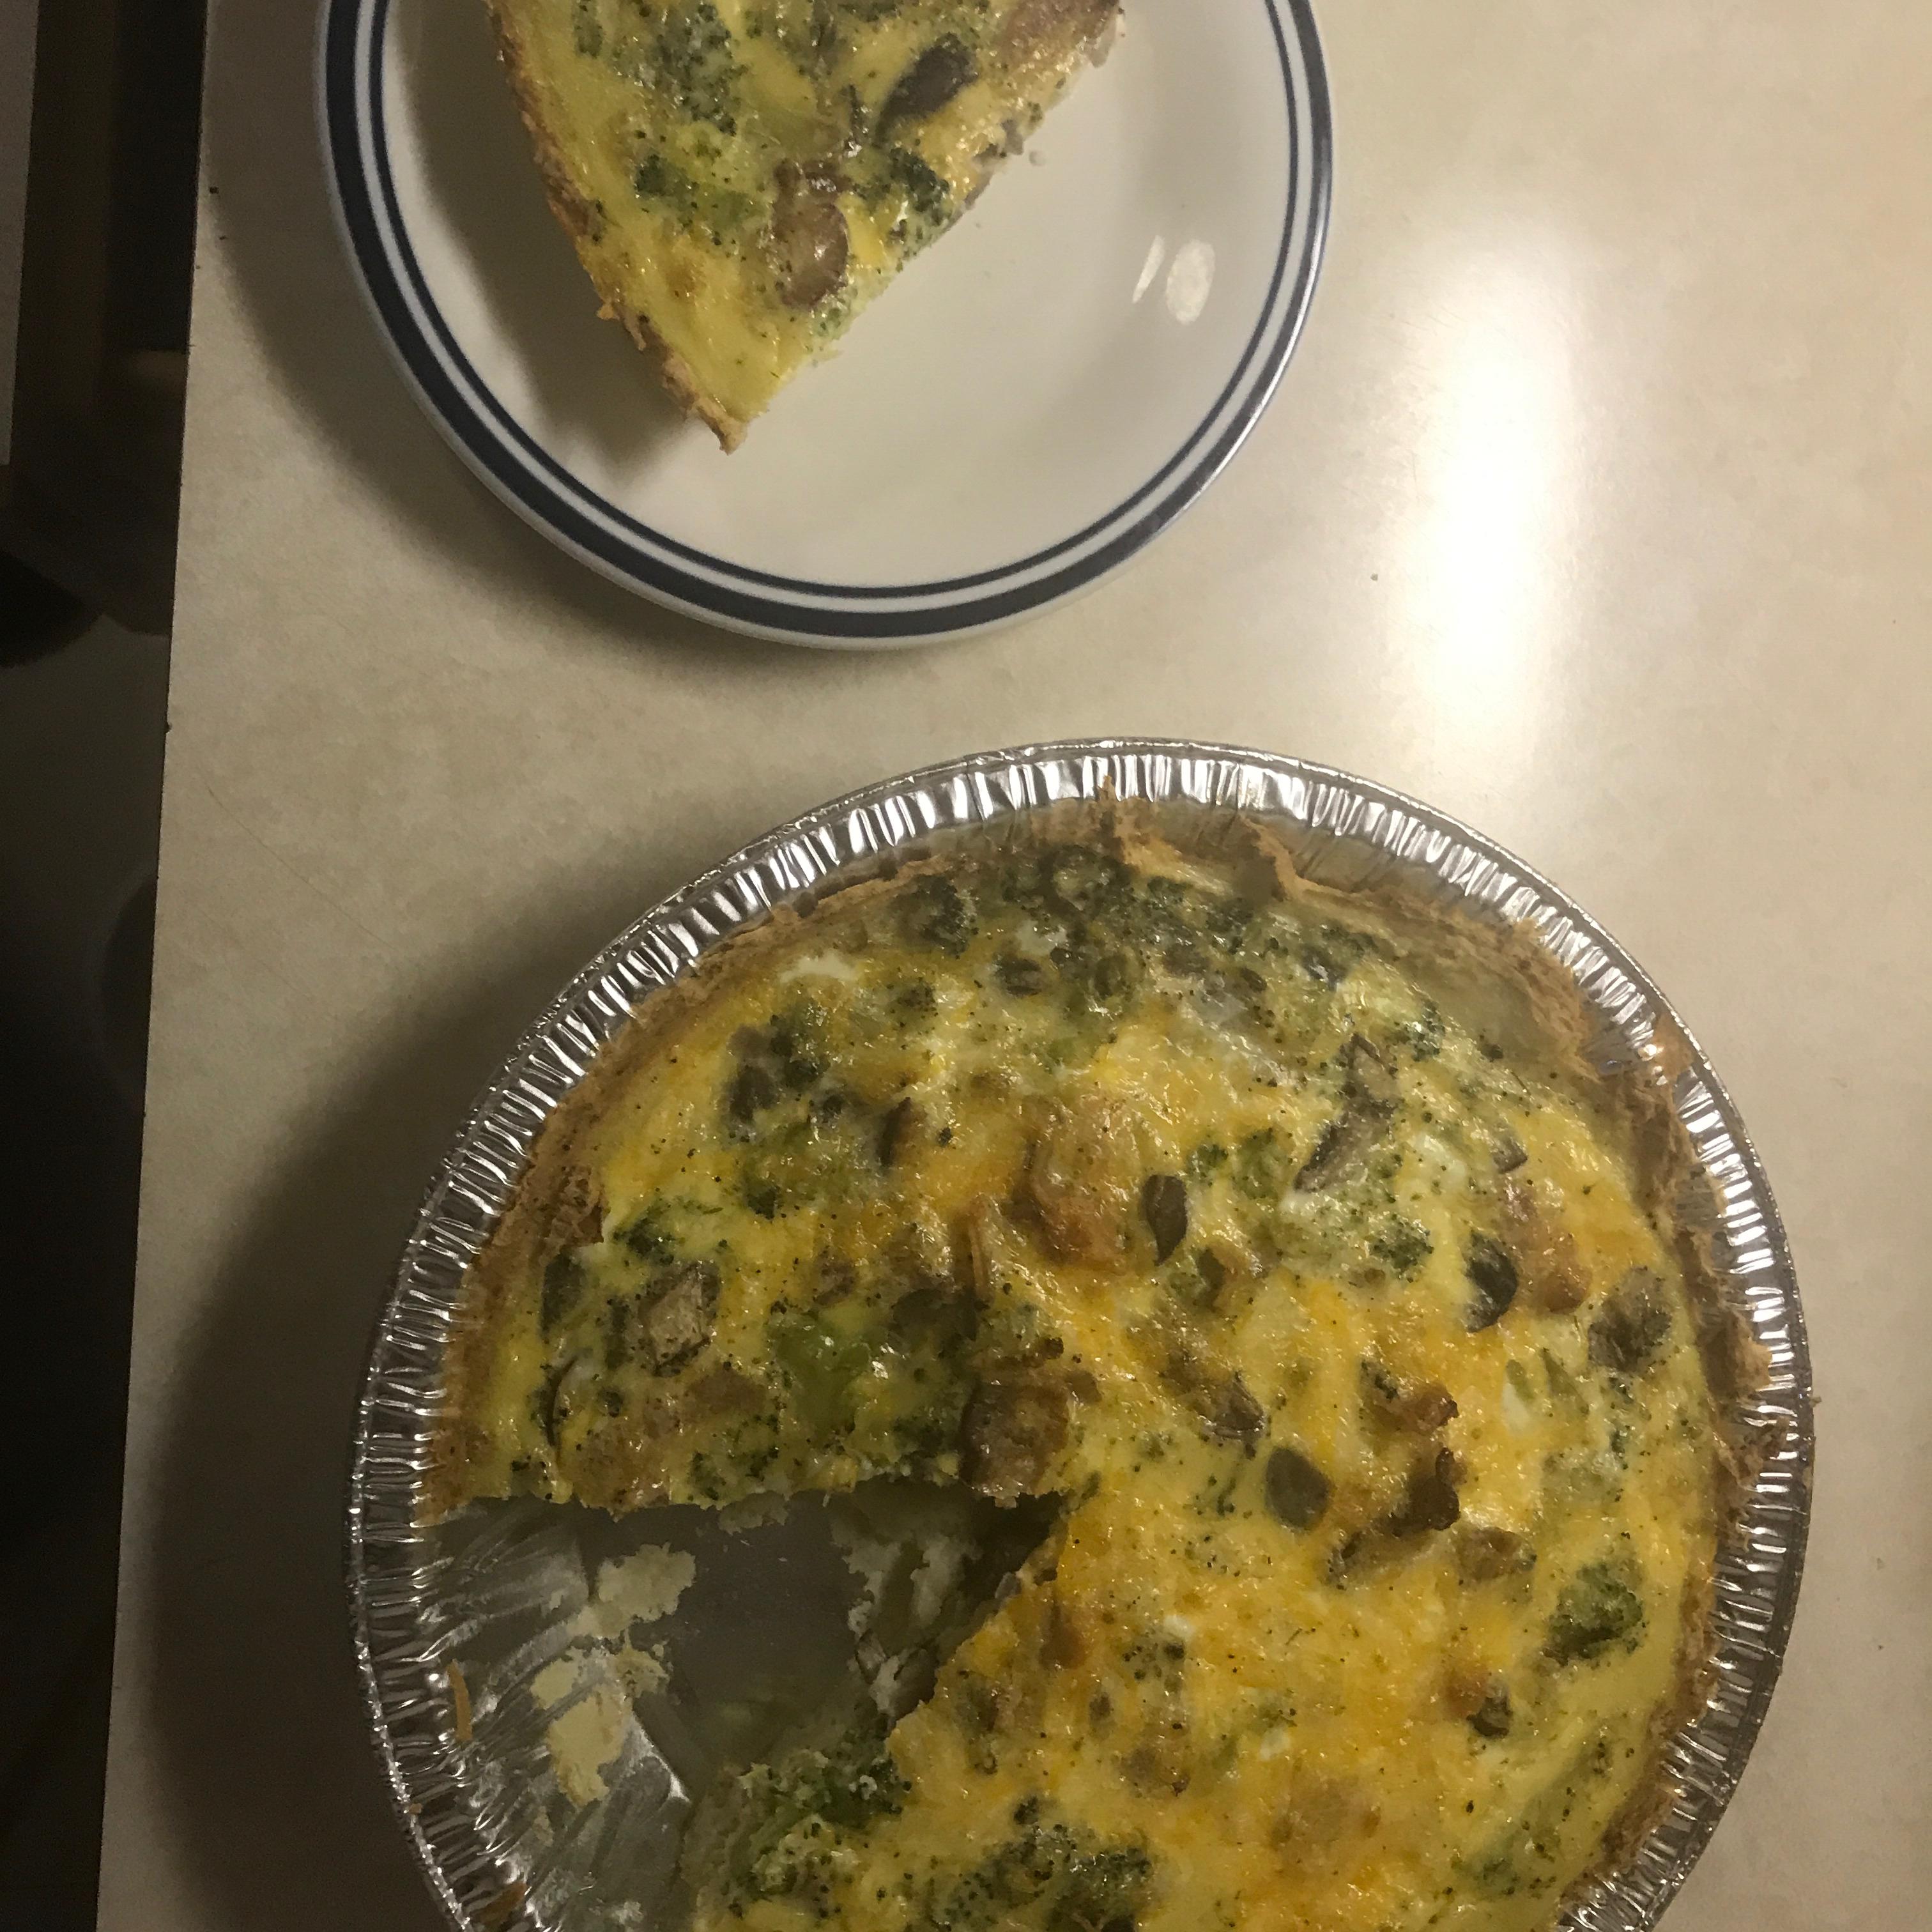 Broccoli Quiche with Mashed Potato Crust cjchope1